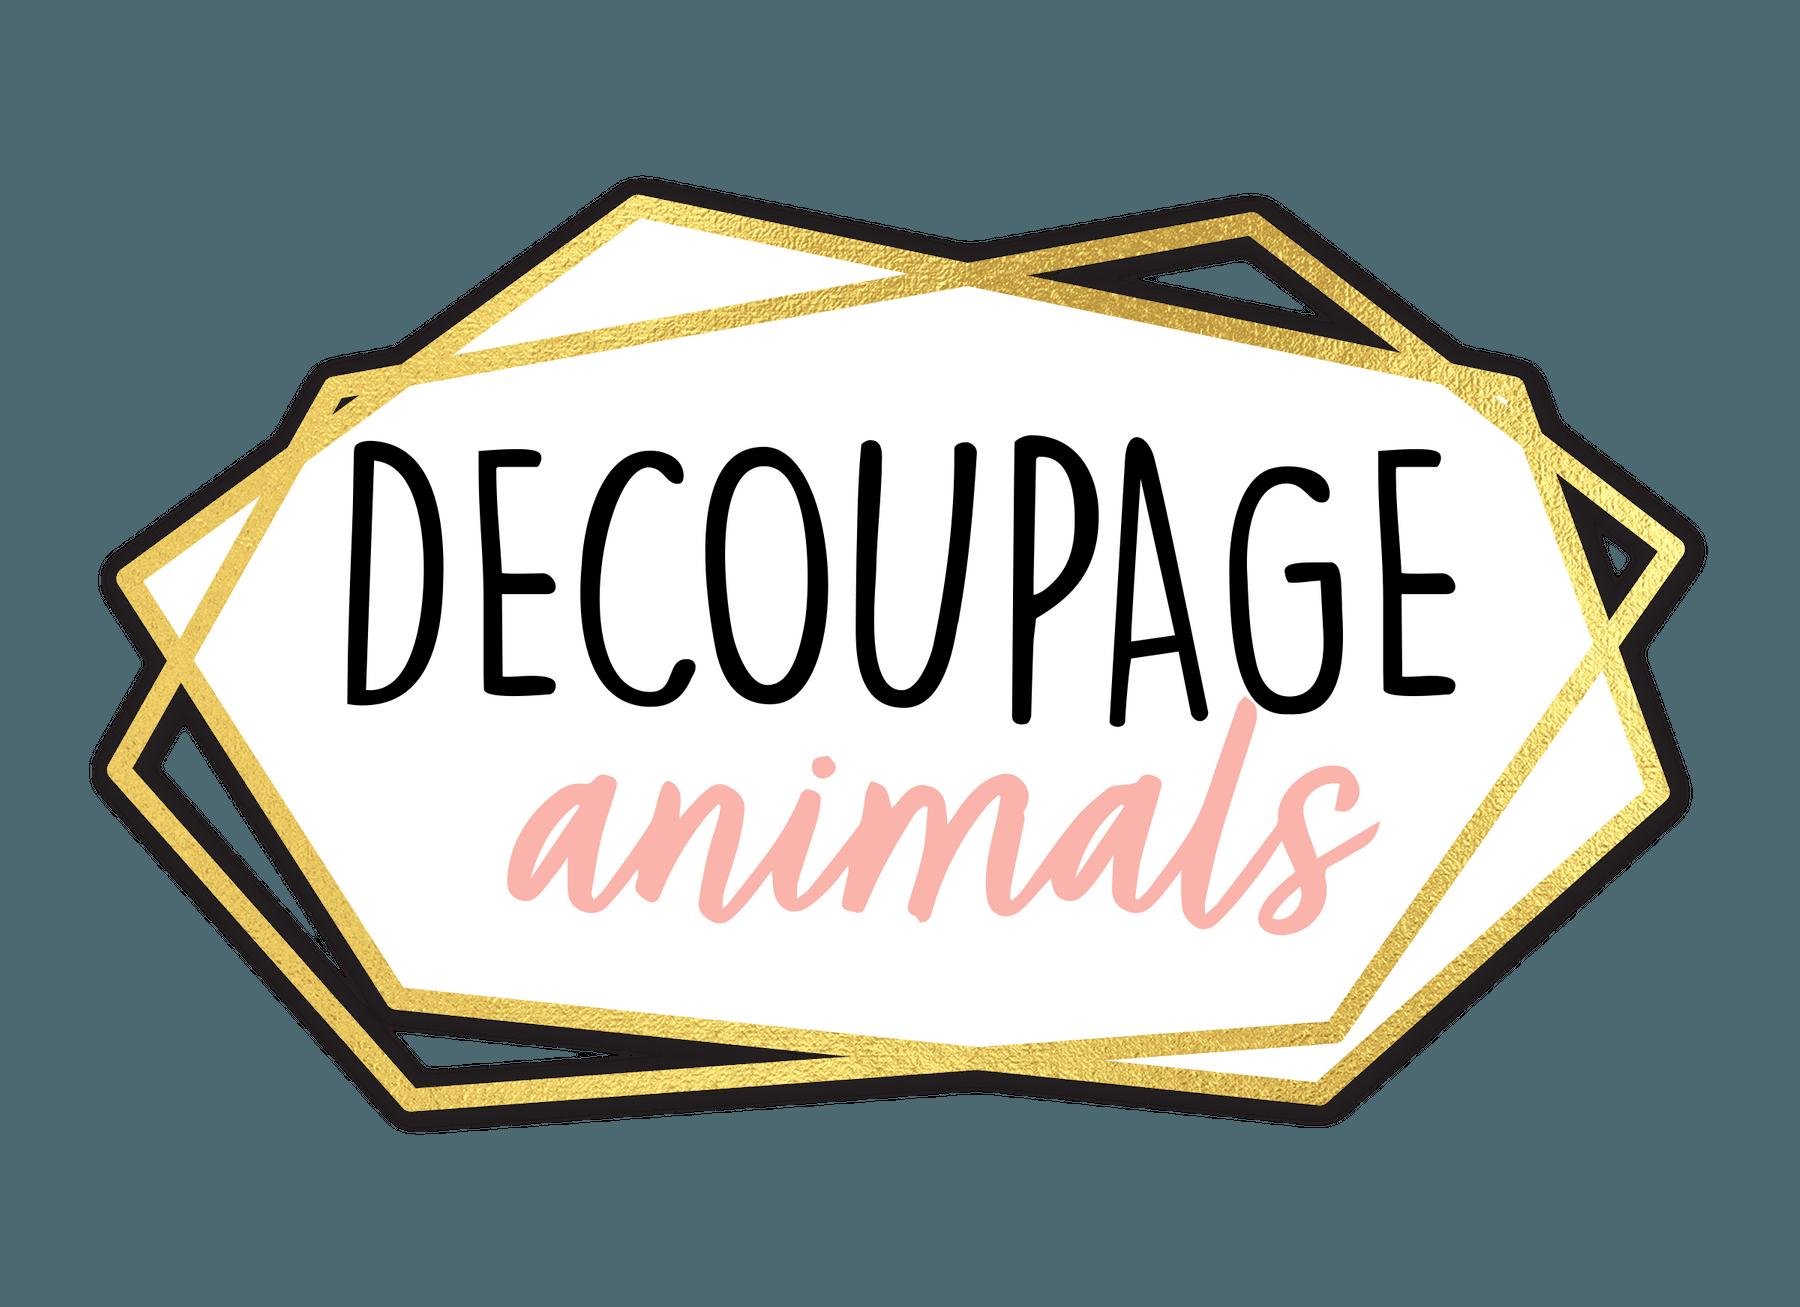 DecoupageAnimals-logo-plain.png